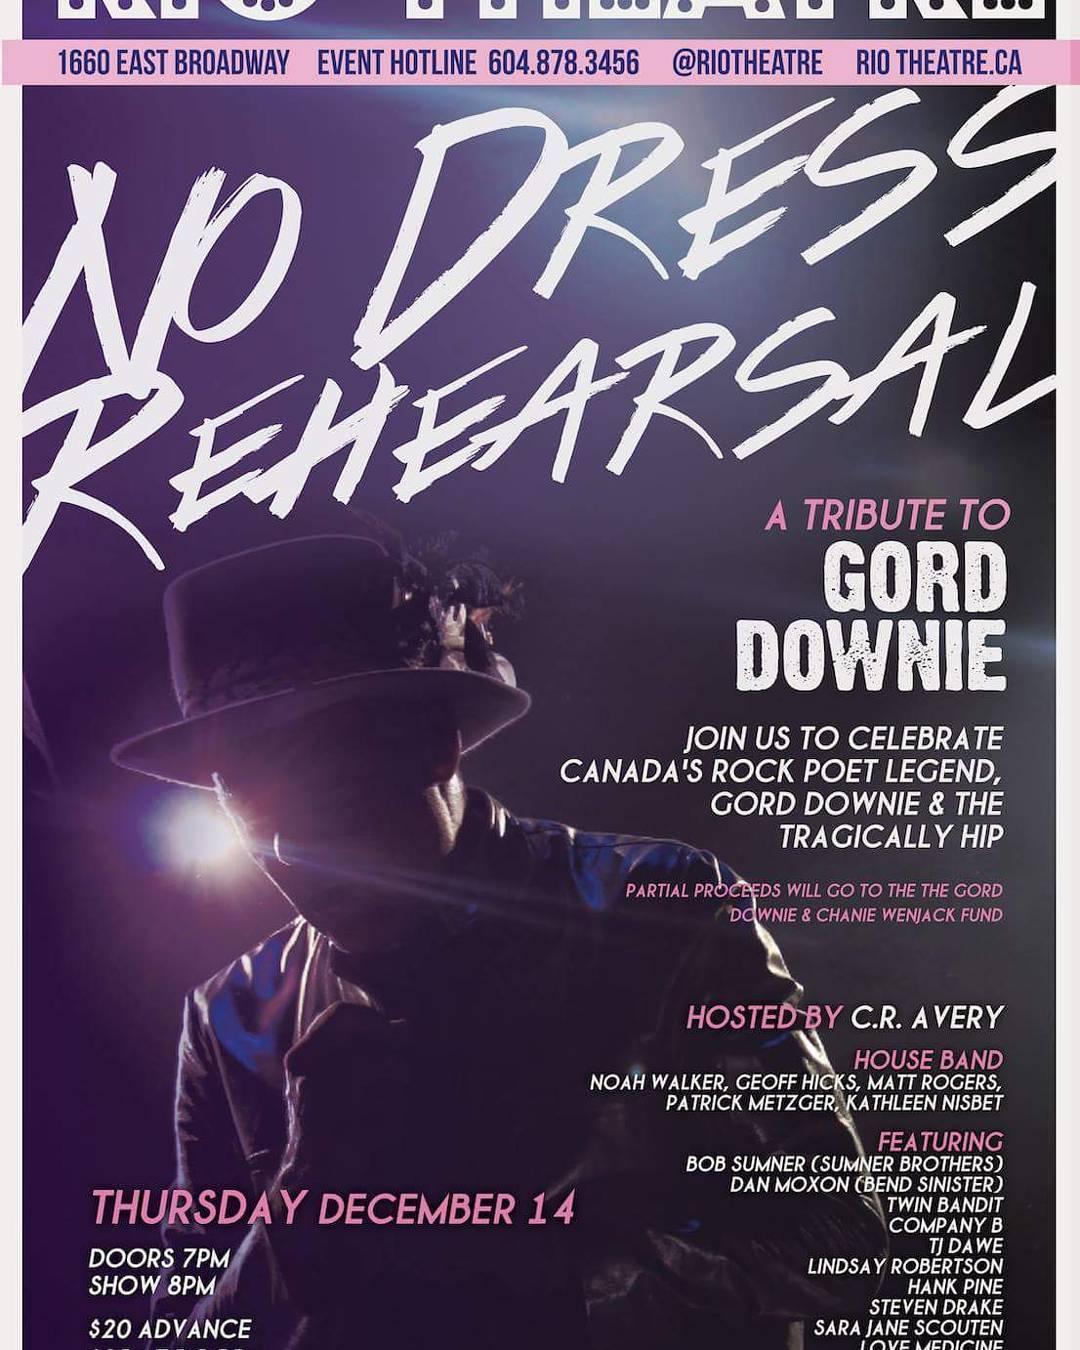 No Dress Rehearsal - A Tribute to Gord Downie